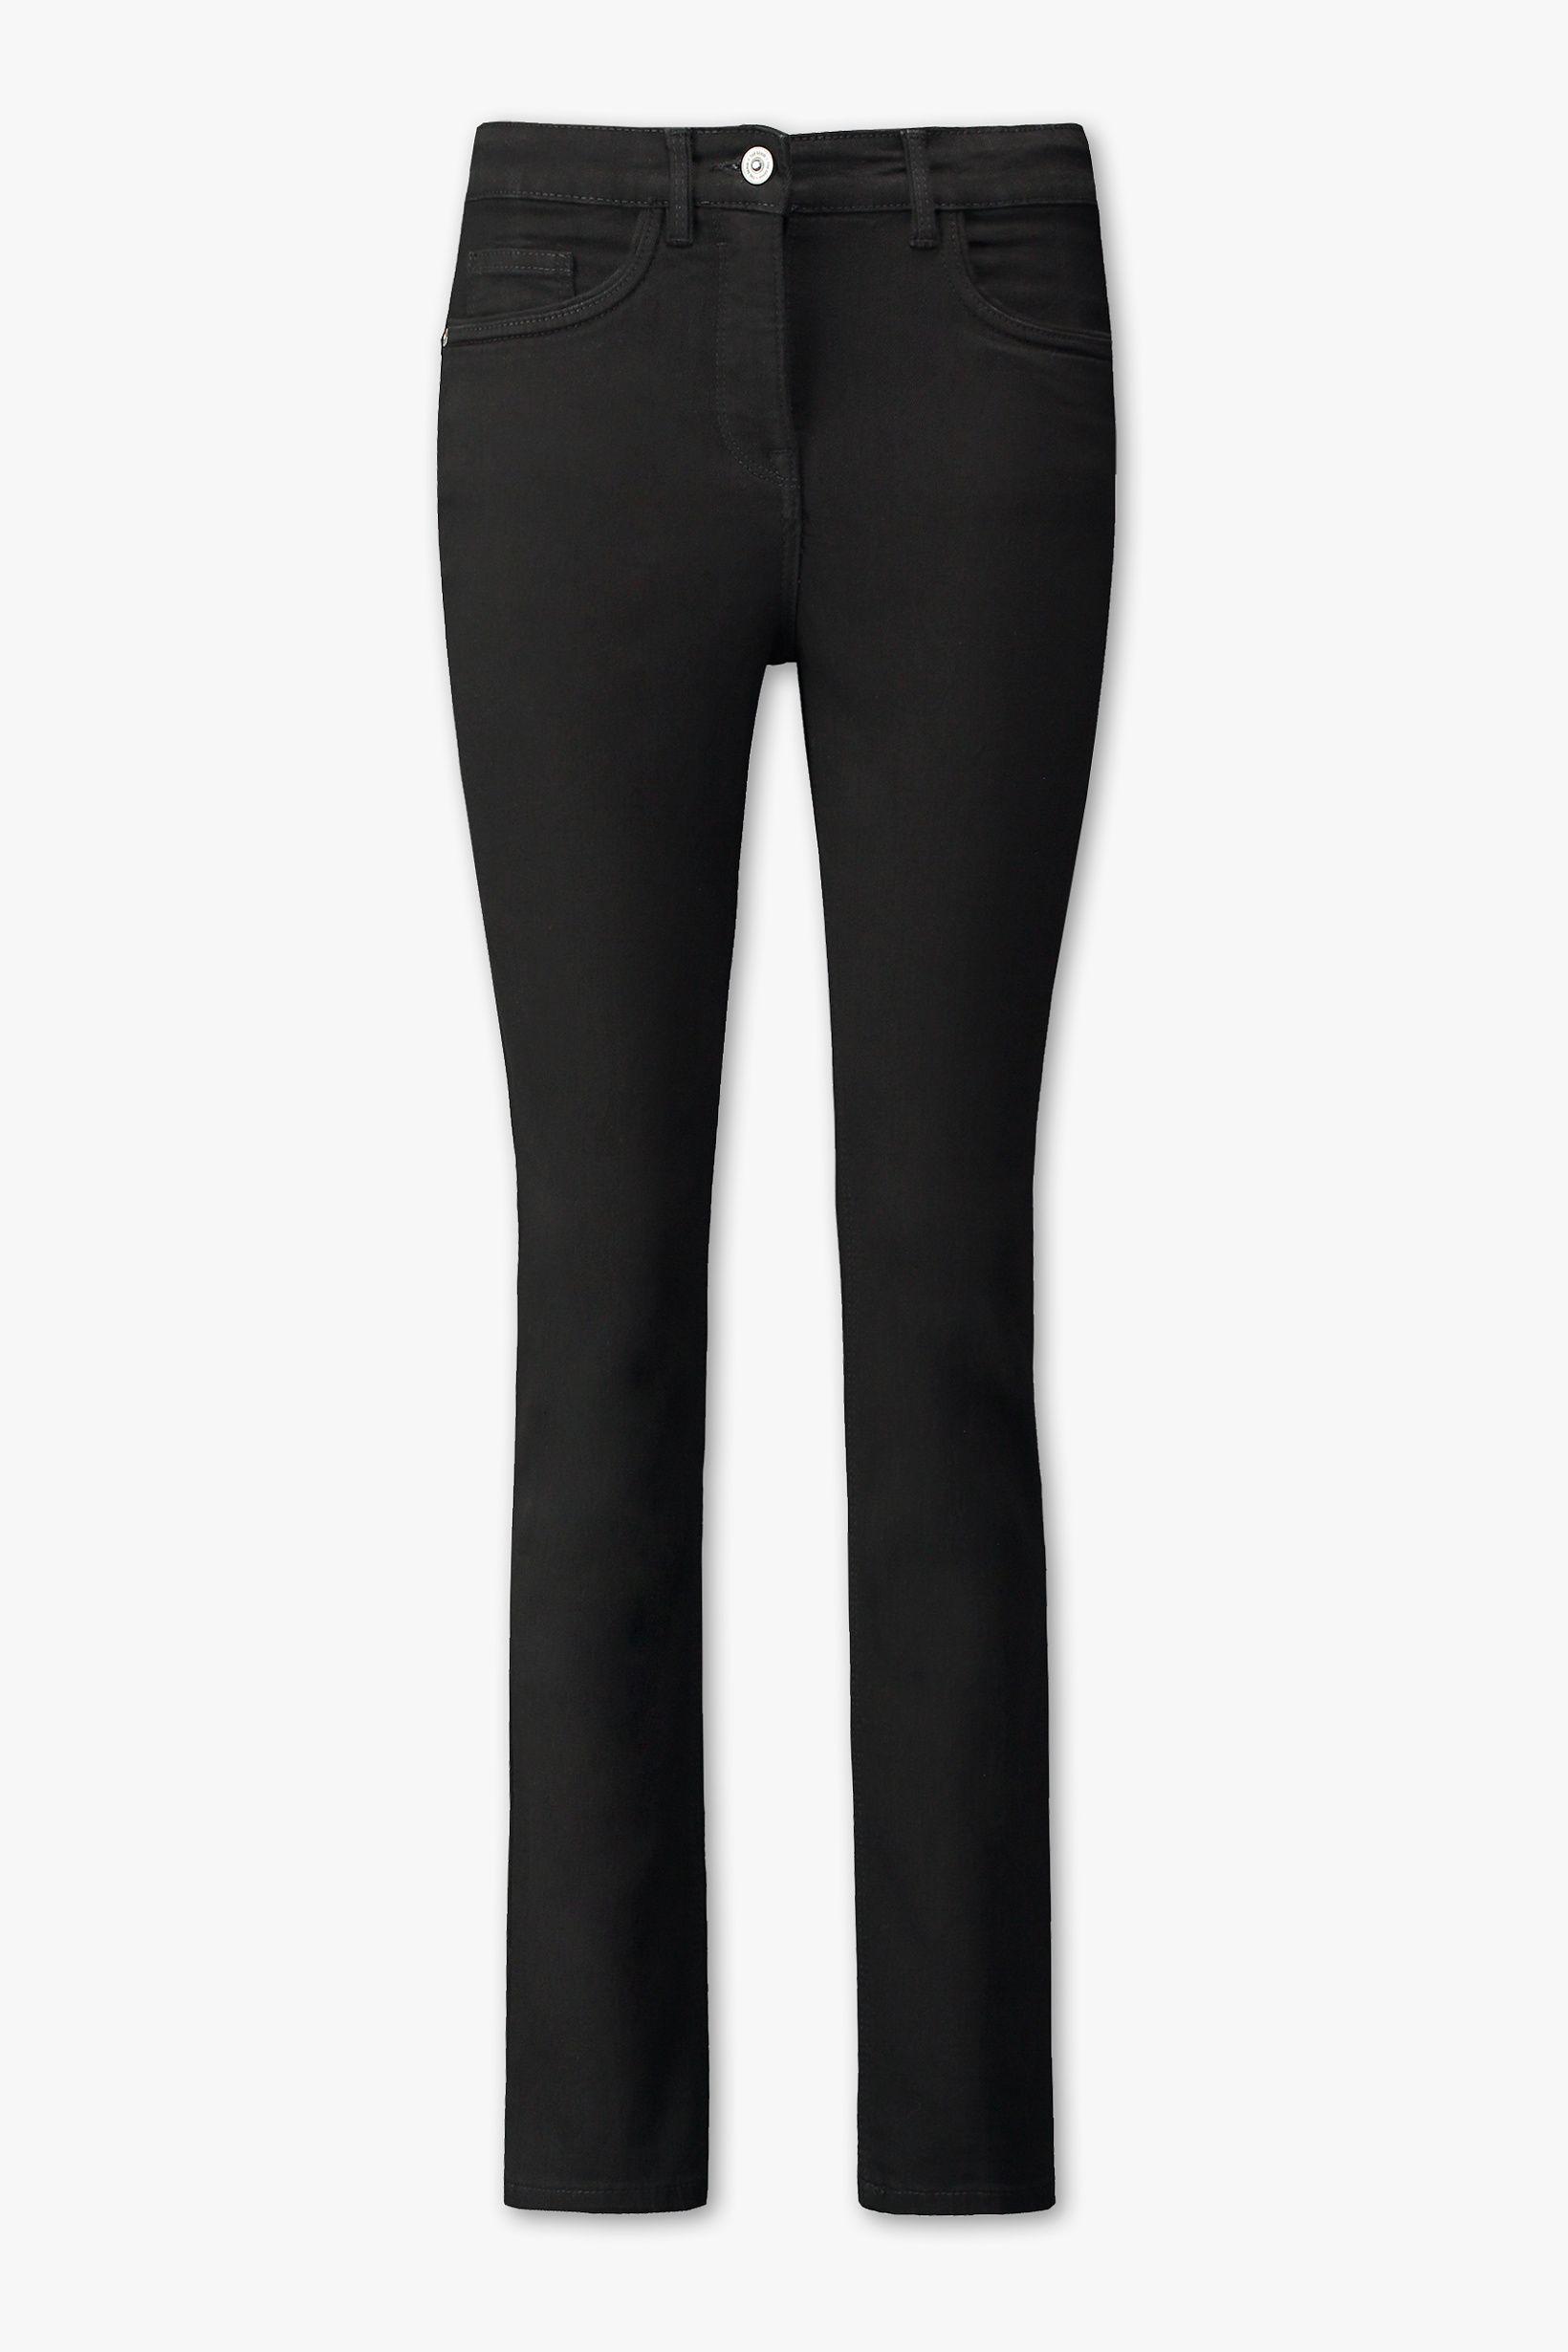 ed97fb3663ce The Denim THE SLIM JEANS CLASSIC FIT - Bauchweg Effekt   Slim jeans